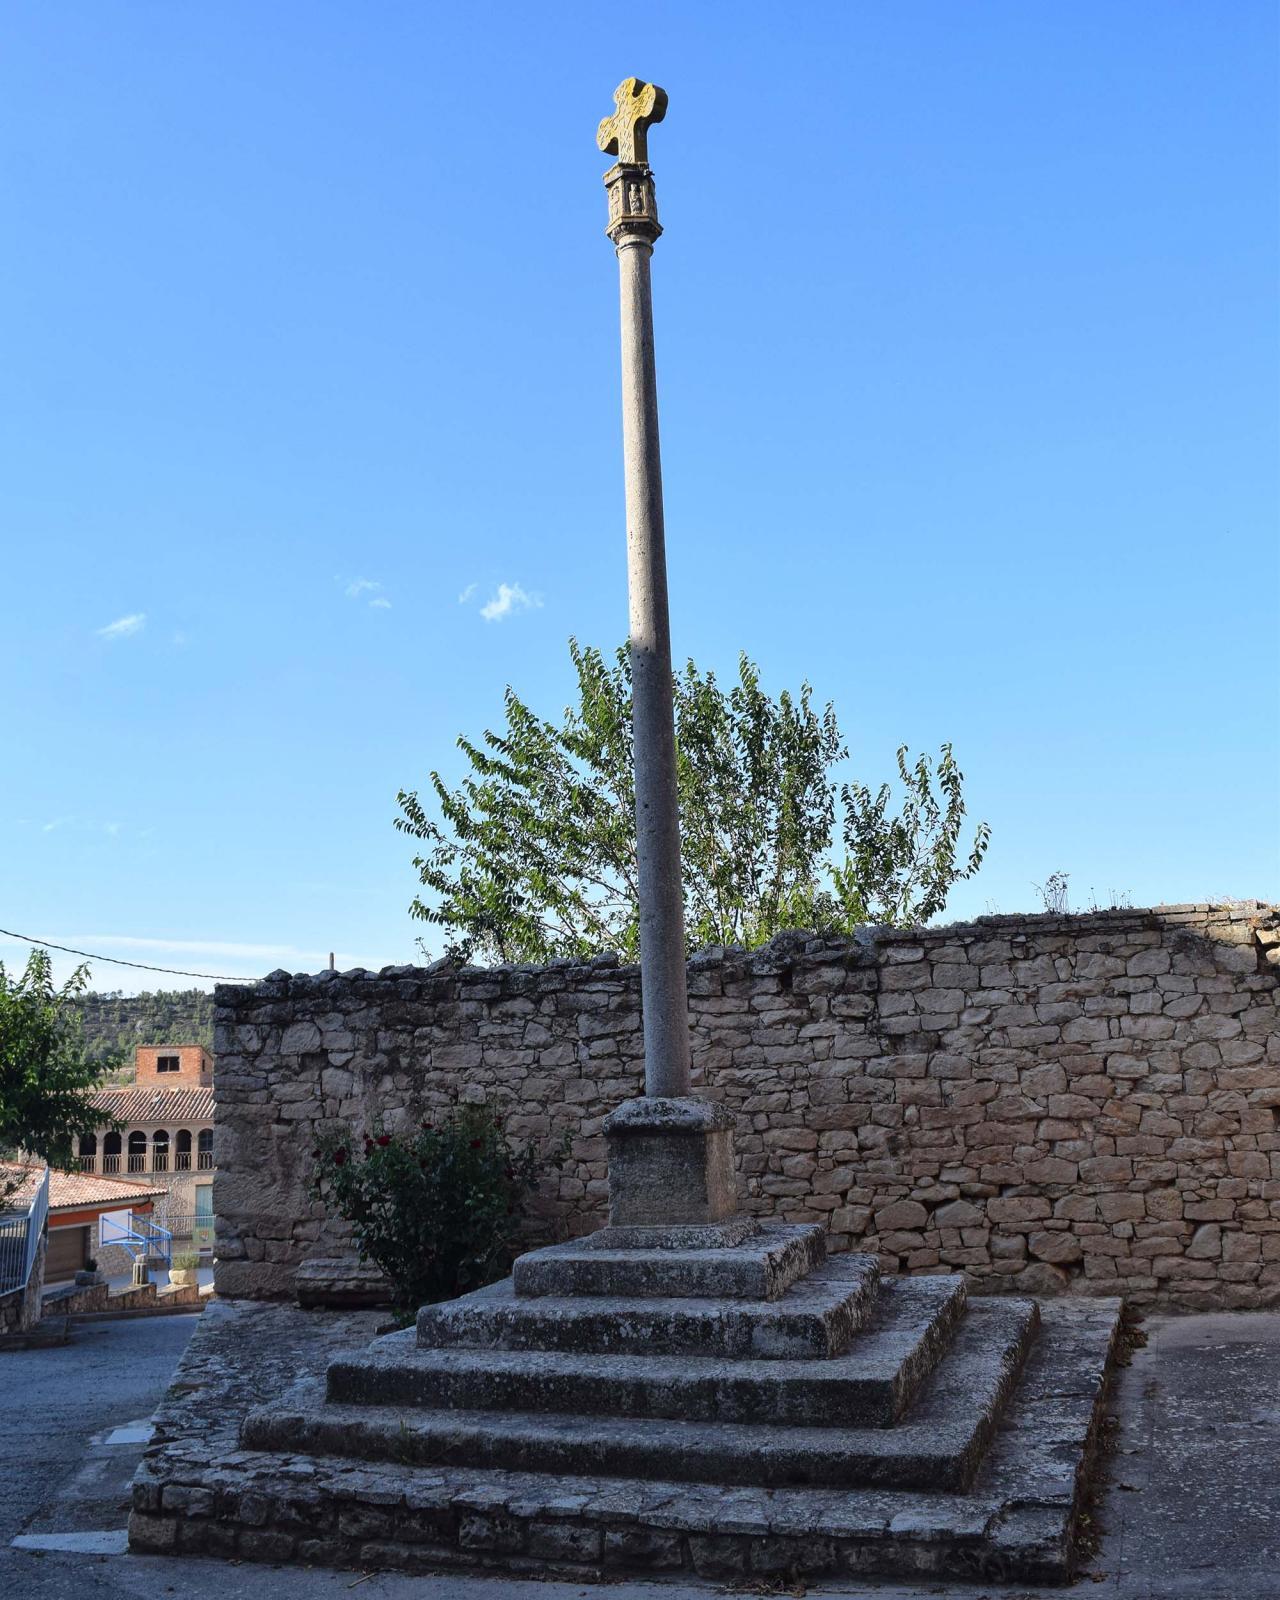 Wayside cross of Llorenç de Rocafort